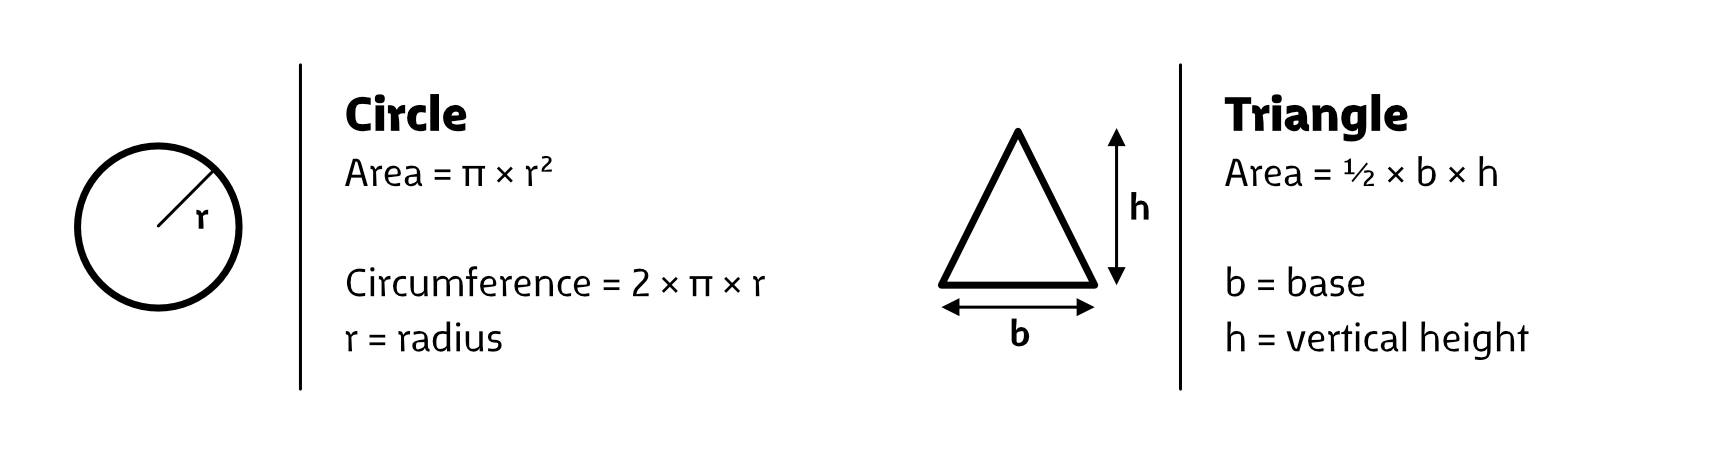 Image-Measure-1